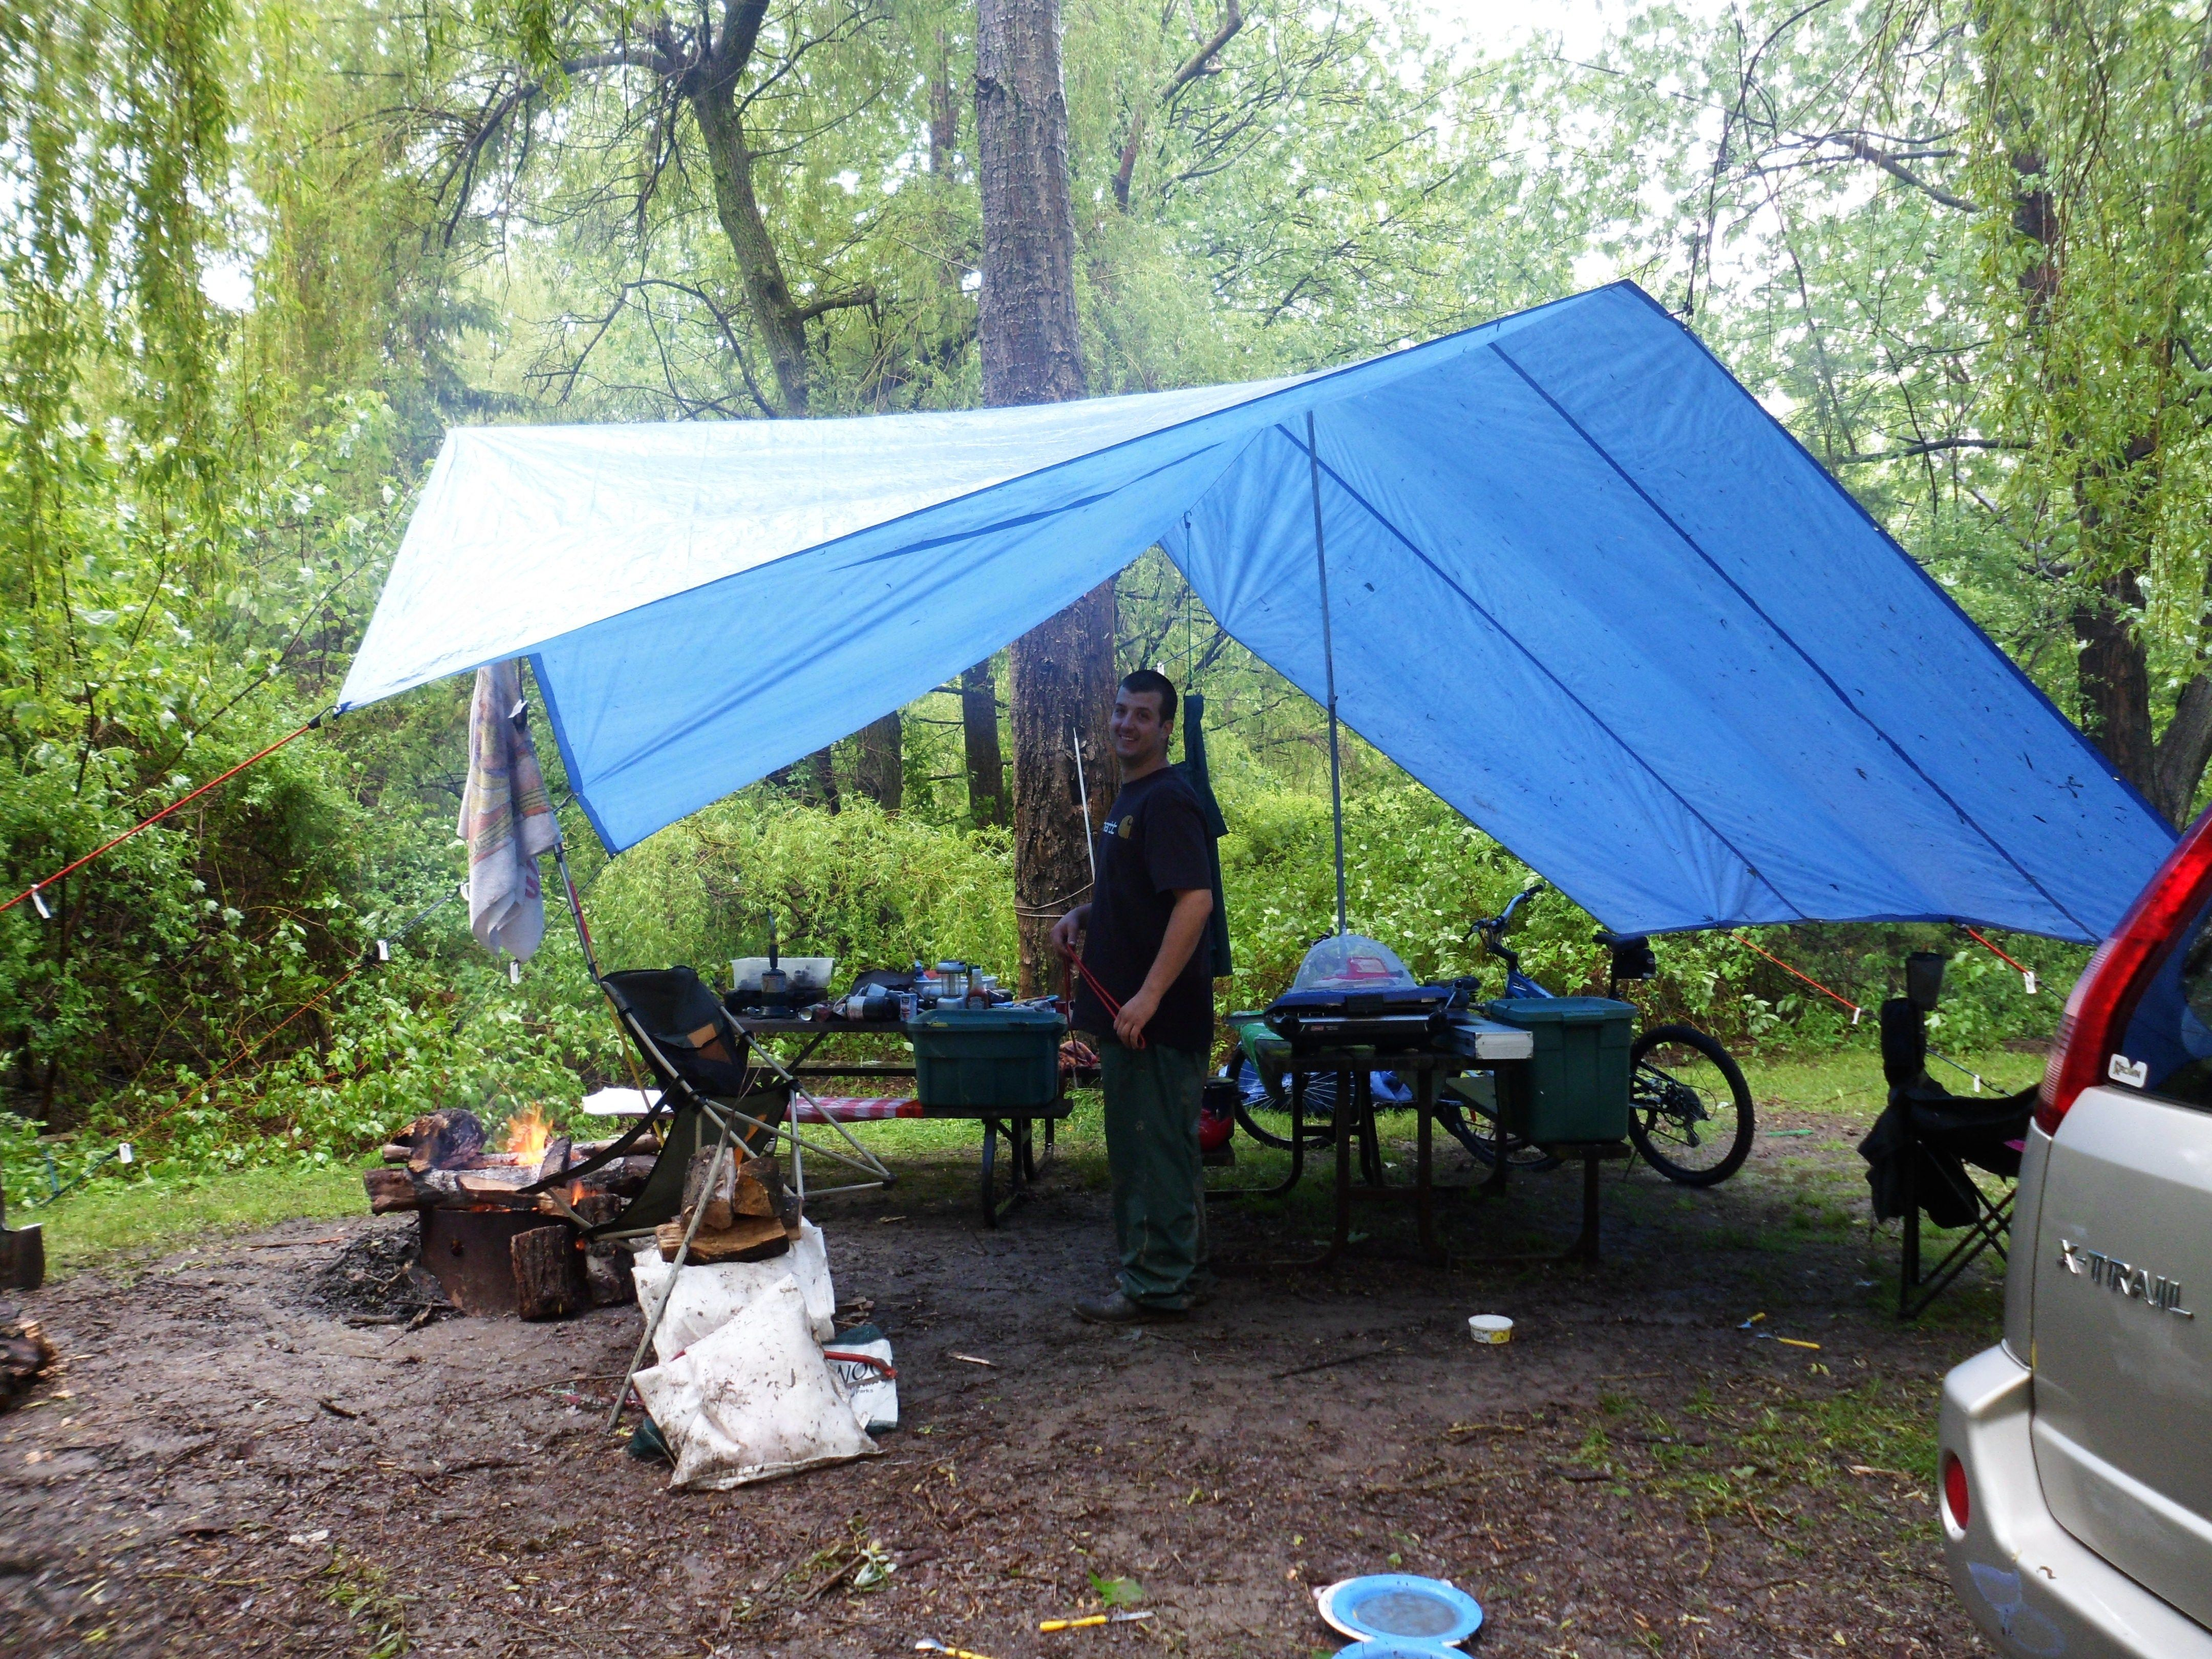 How to Set Up a Tarp for Camping   Camping tarp, Camping ...